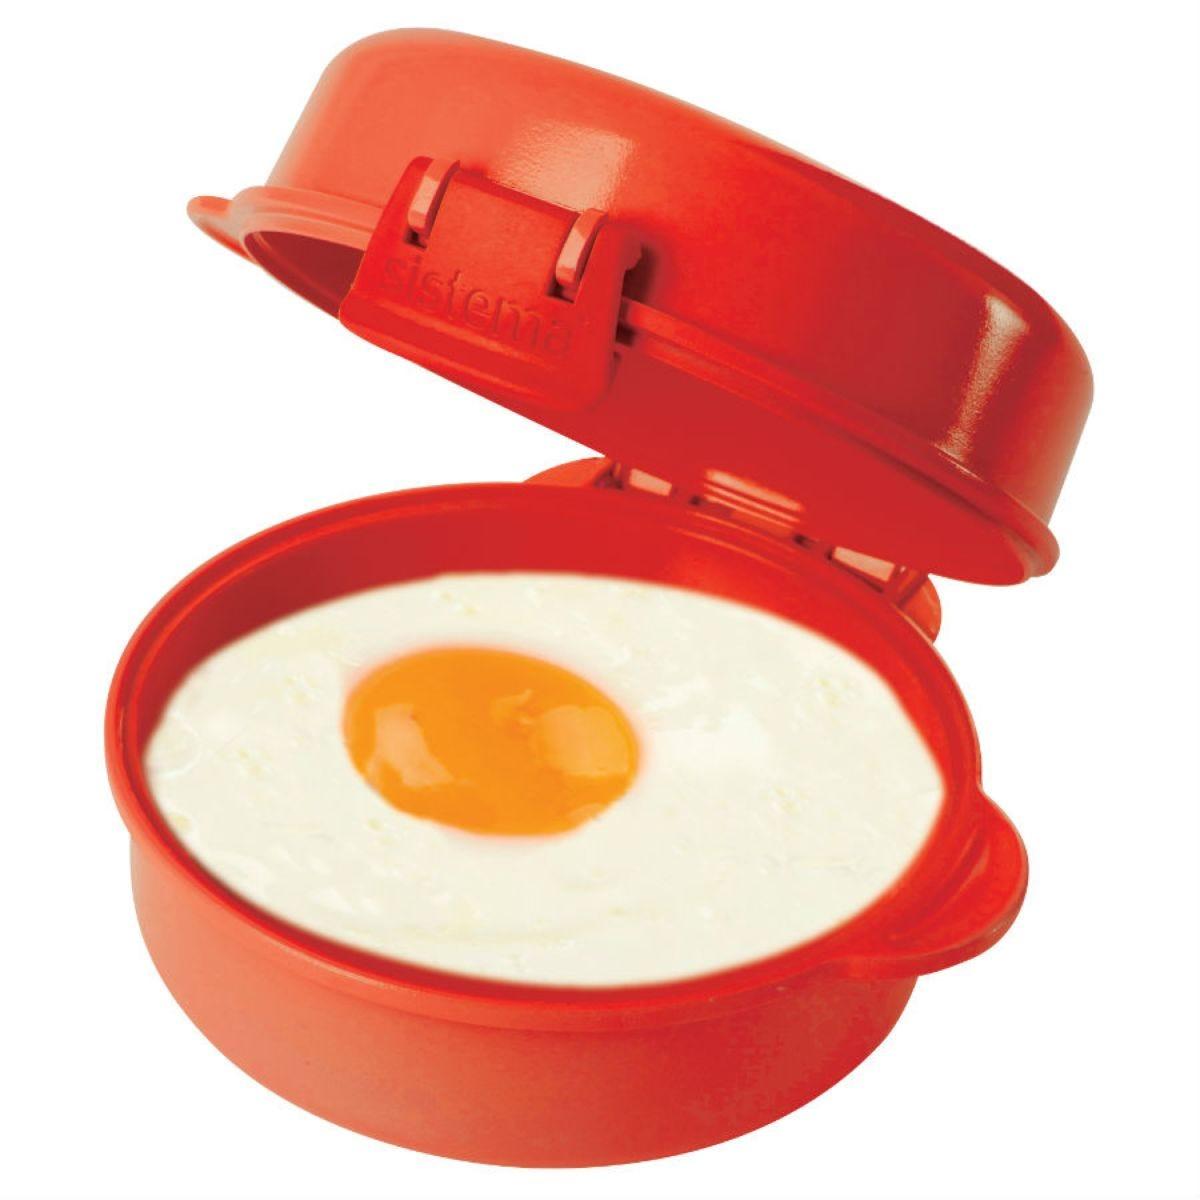 Sistema Easy Eggs